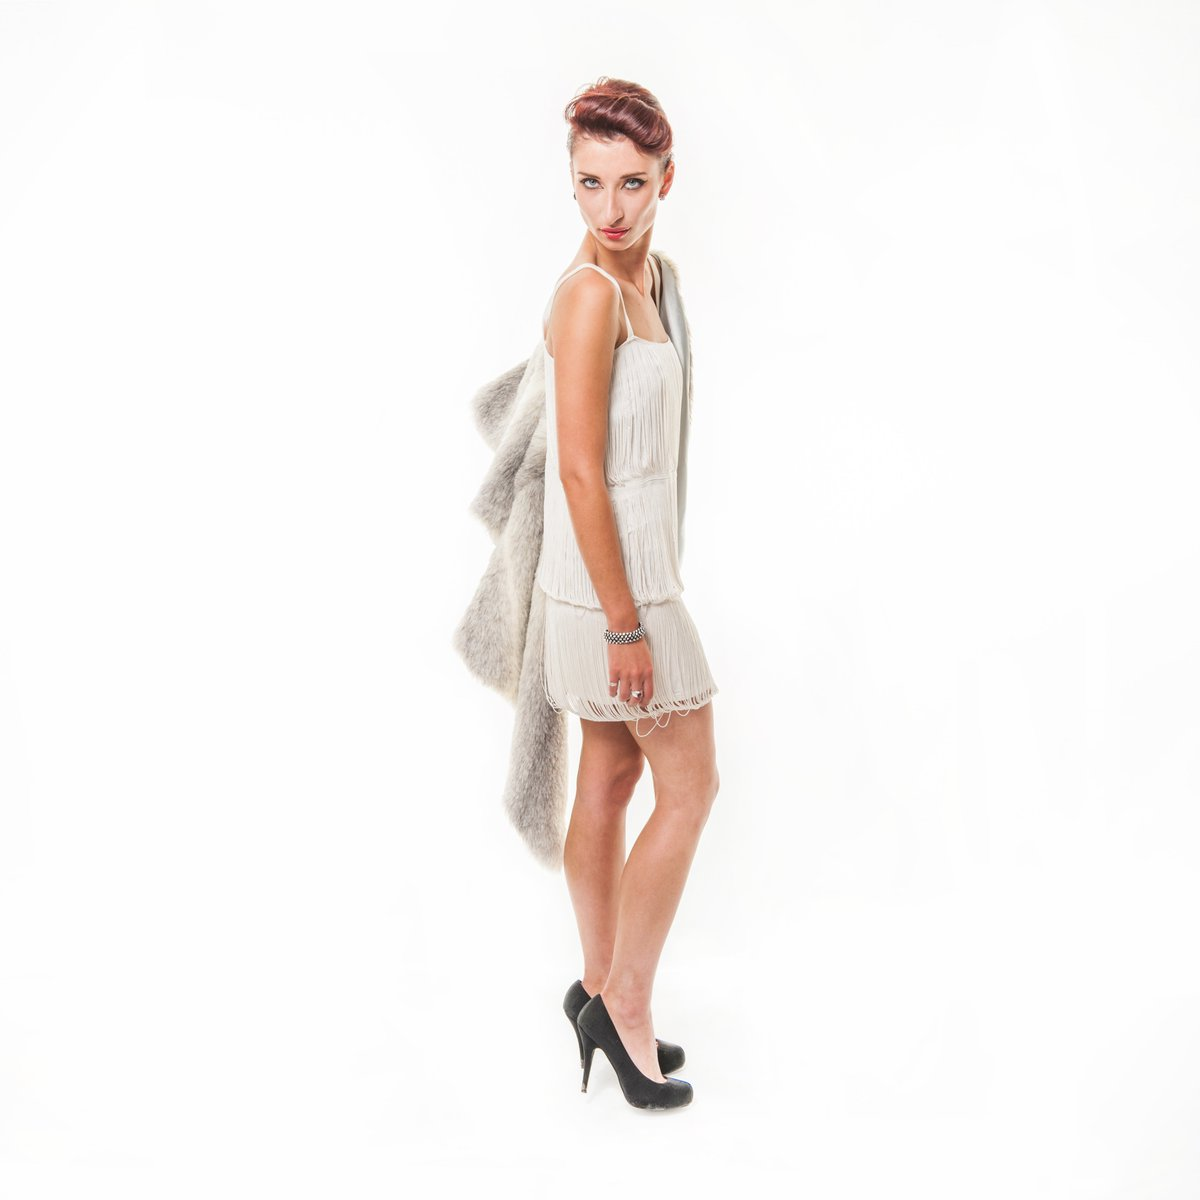 Lydia #lastolite #hilite #manfrotto #elinchrom #dlite #model #fashion